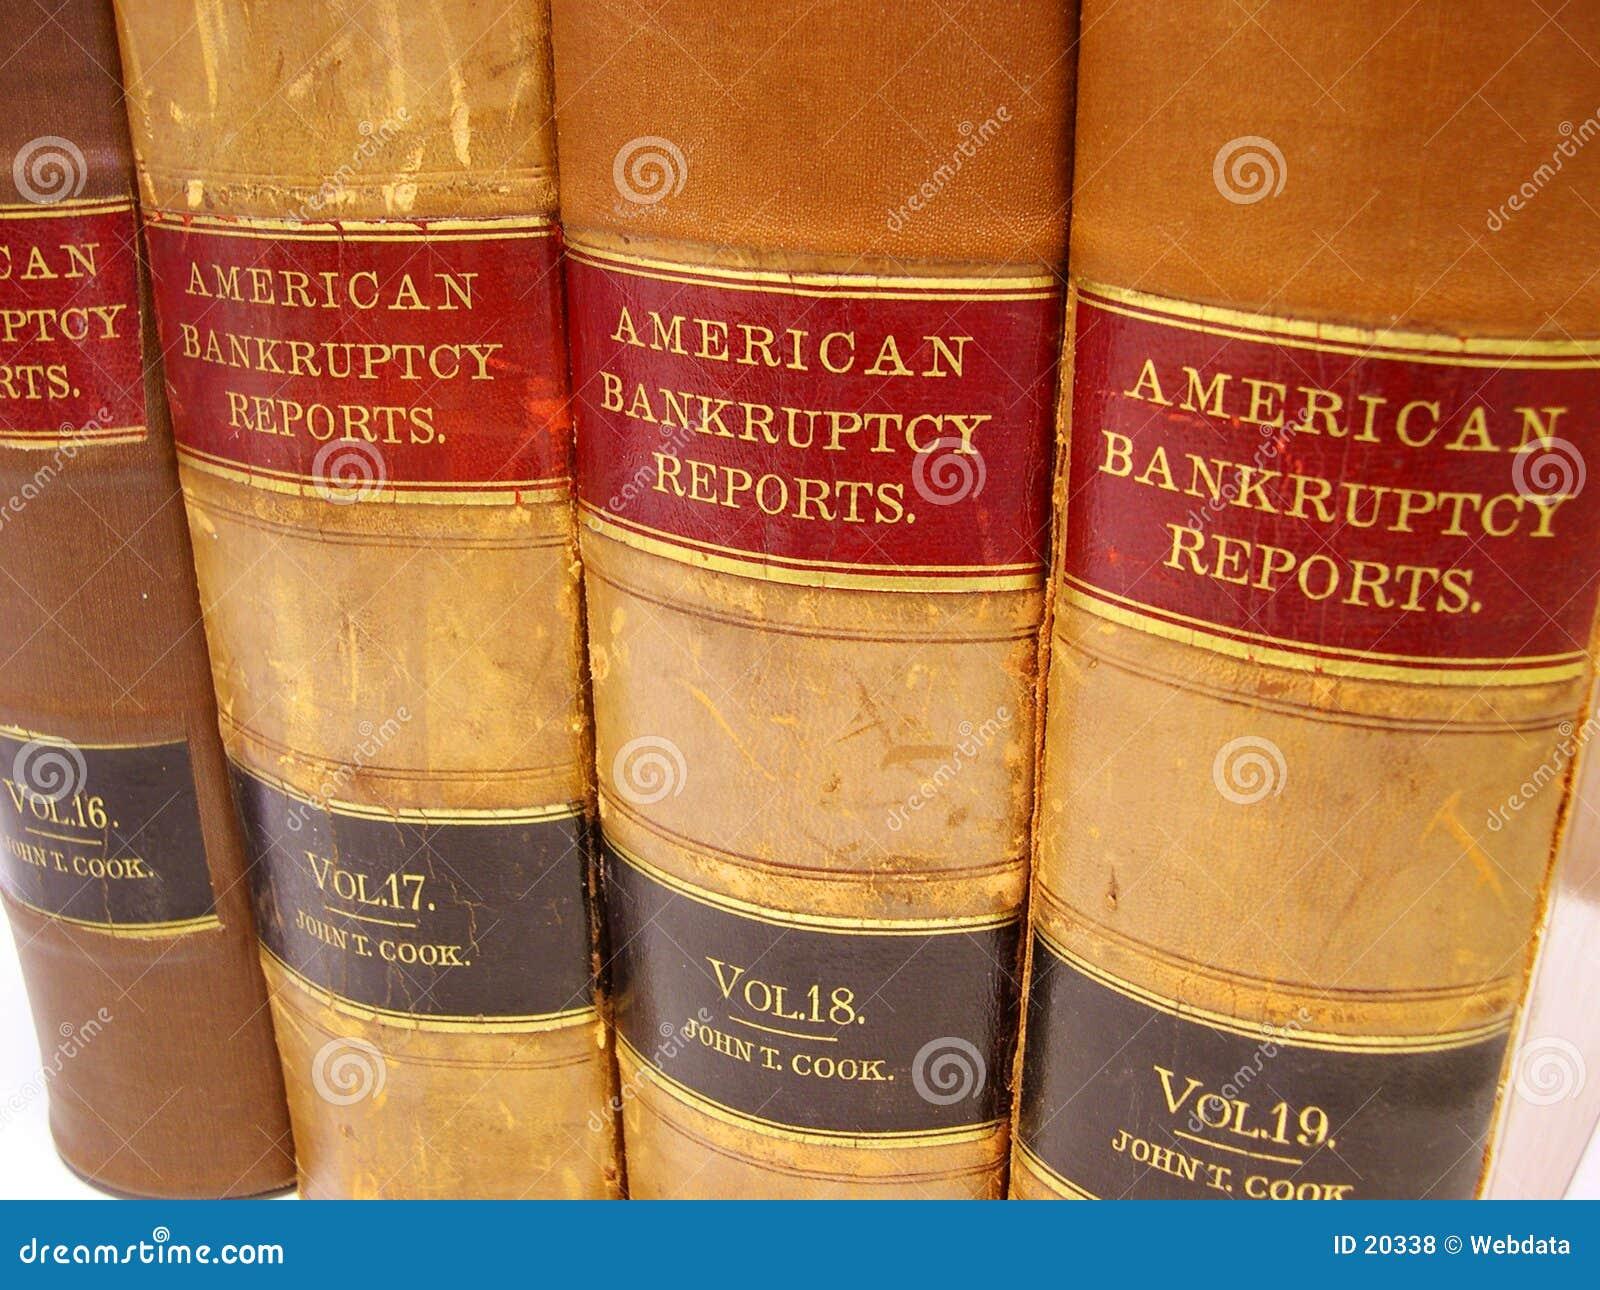 Bankructwo zastrzega sobie prawo